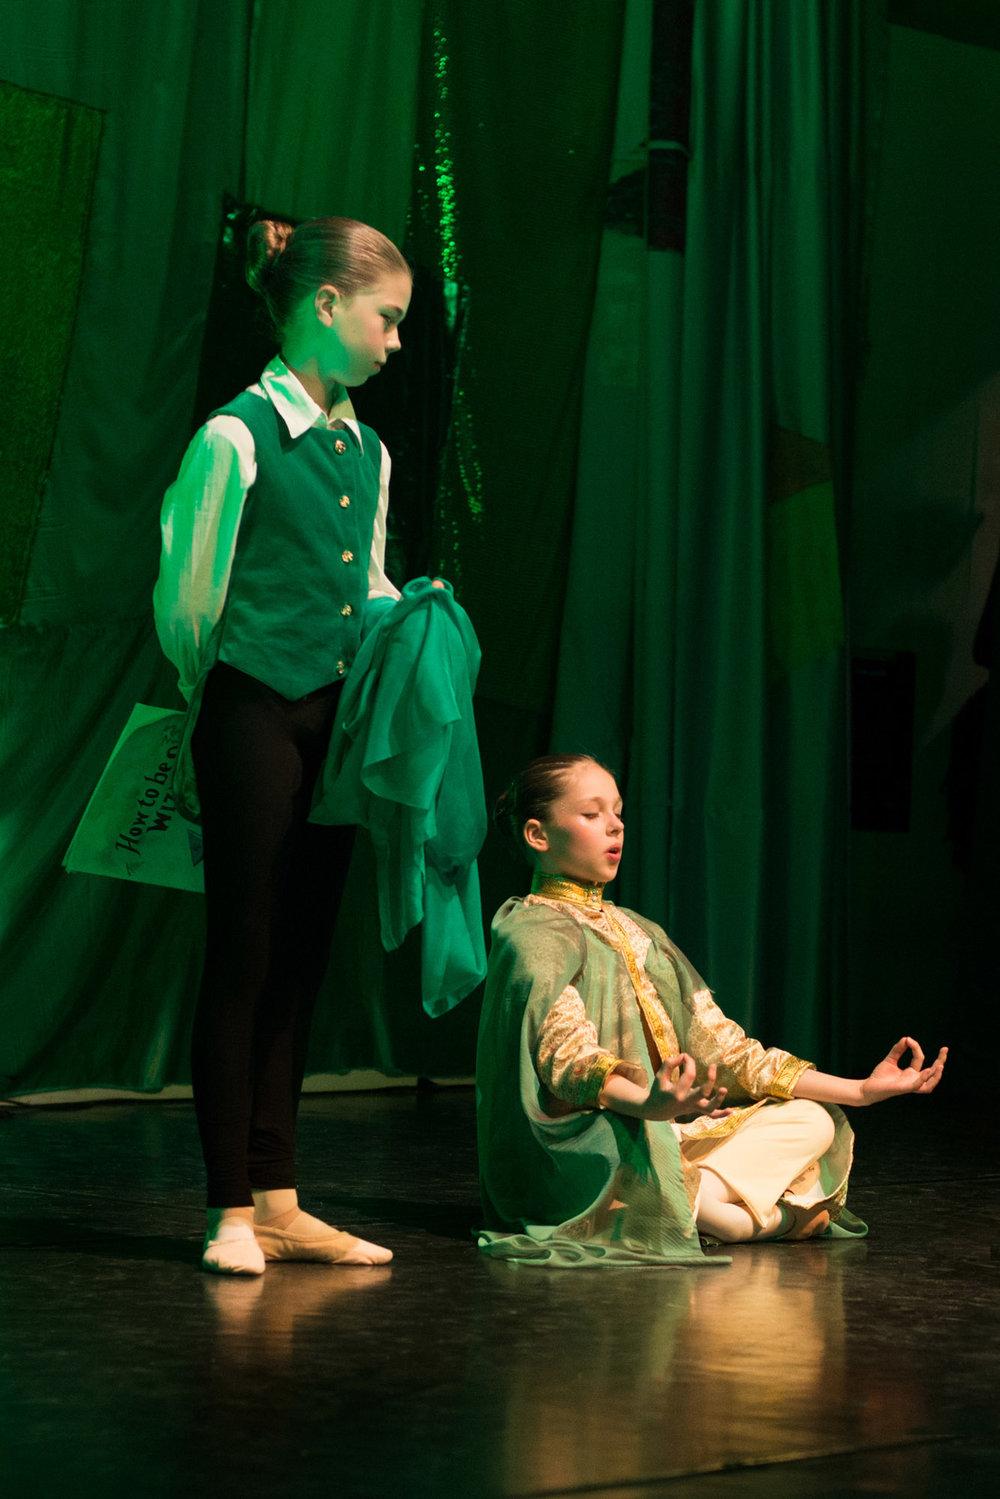 2014_Wizard_of_Oz Ballet School London 6.jpg